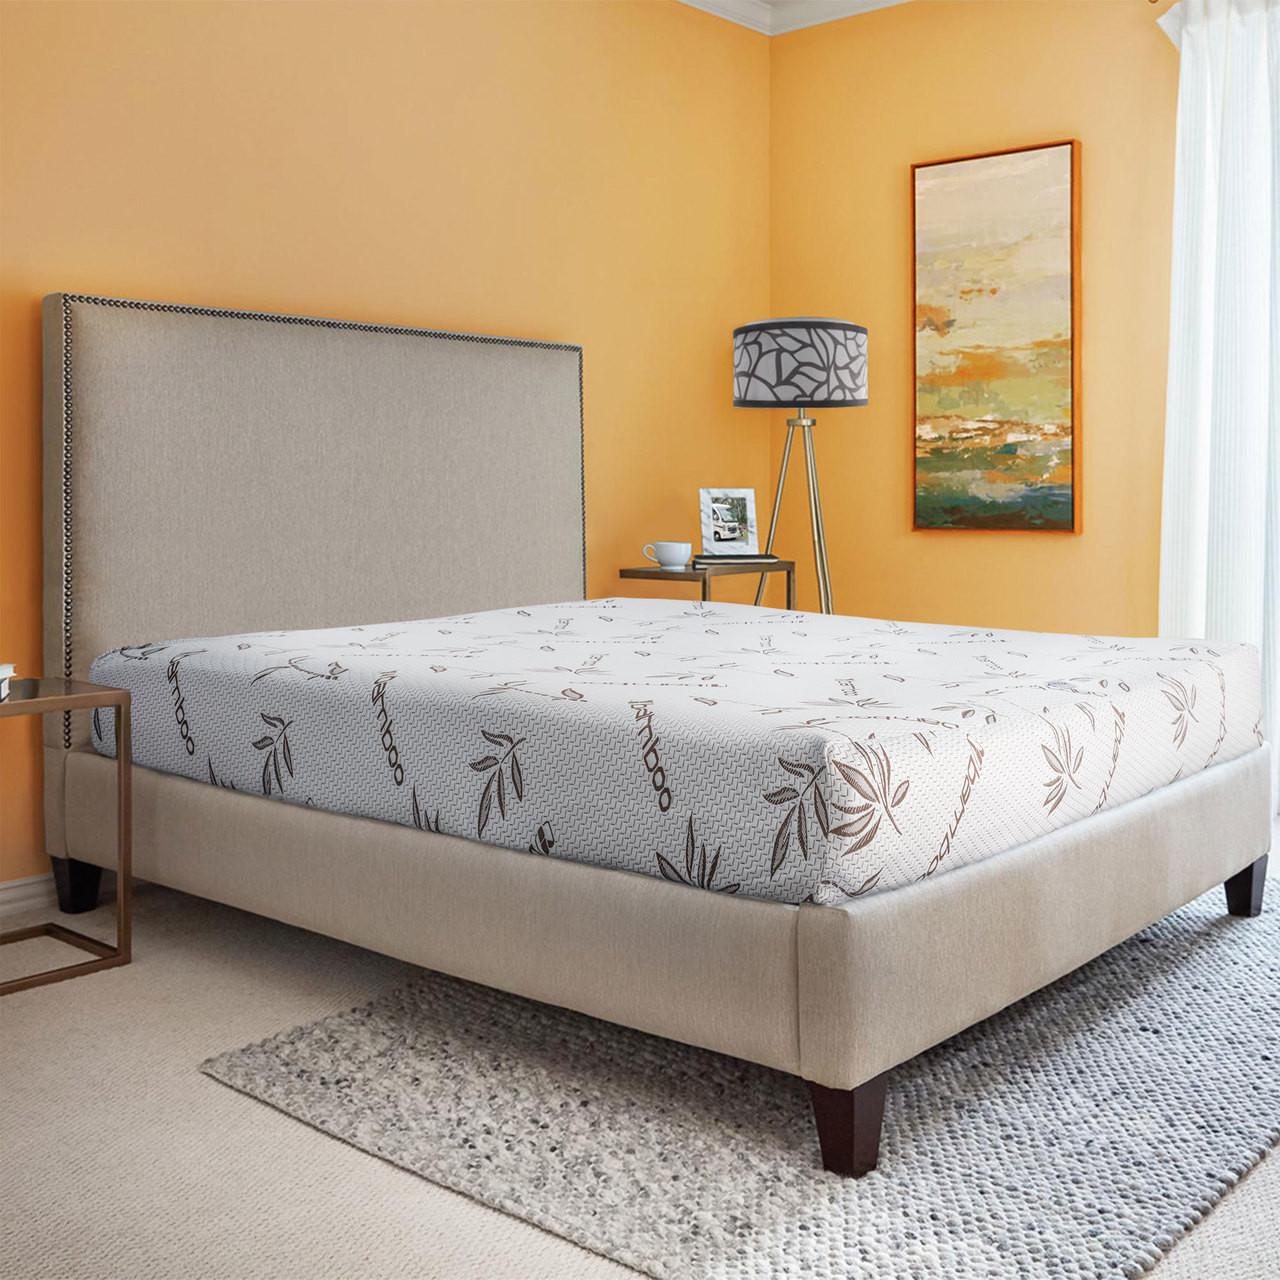 Rv Bunk Bed Mattress Memory Foam Gel Infused Cooling Layer Bunk